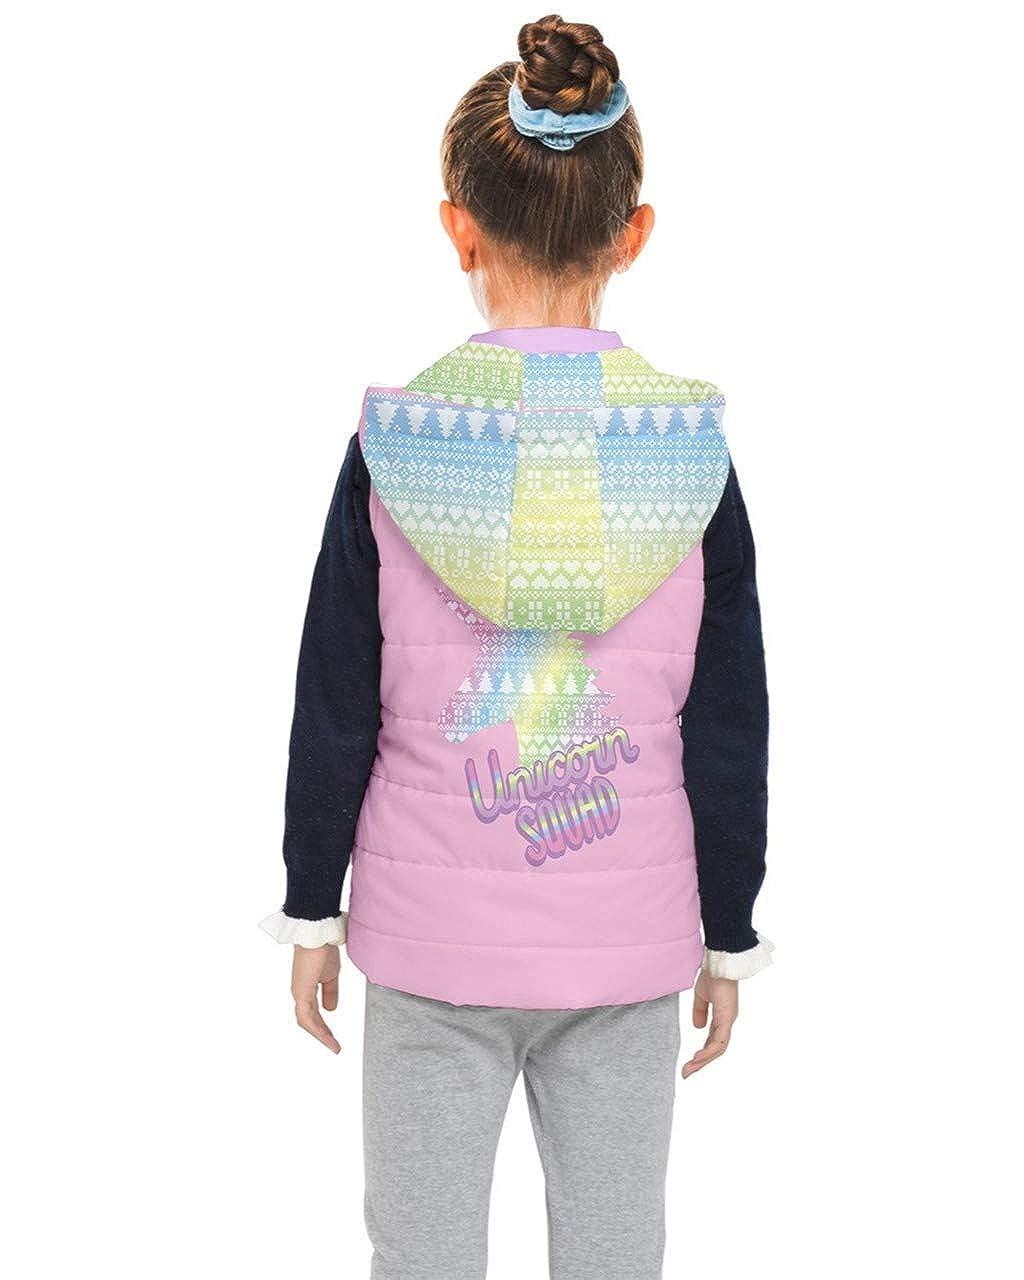 PattyCandy Light Girly Unicorns and Rainbows Patterns on Kids Unisex Puffer Vest with Hoodie PattyCandy-135823936